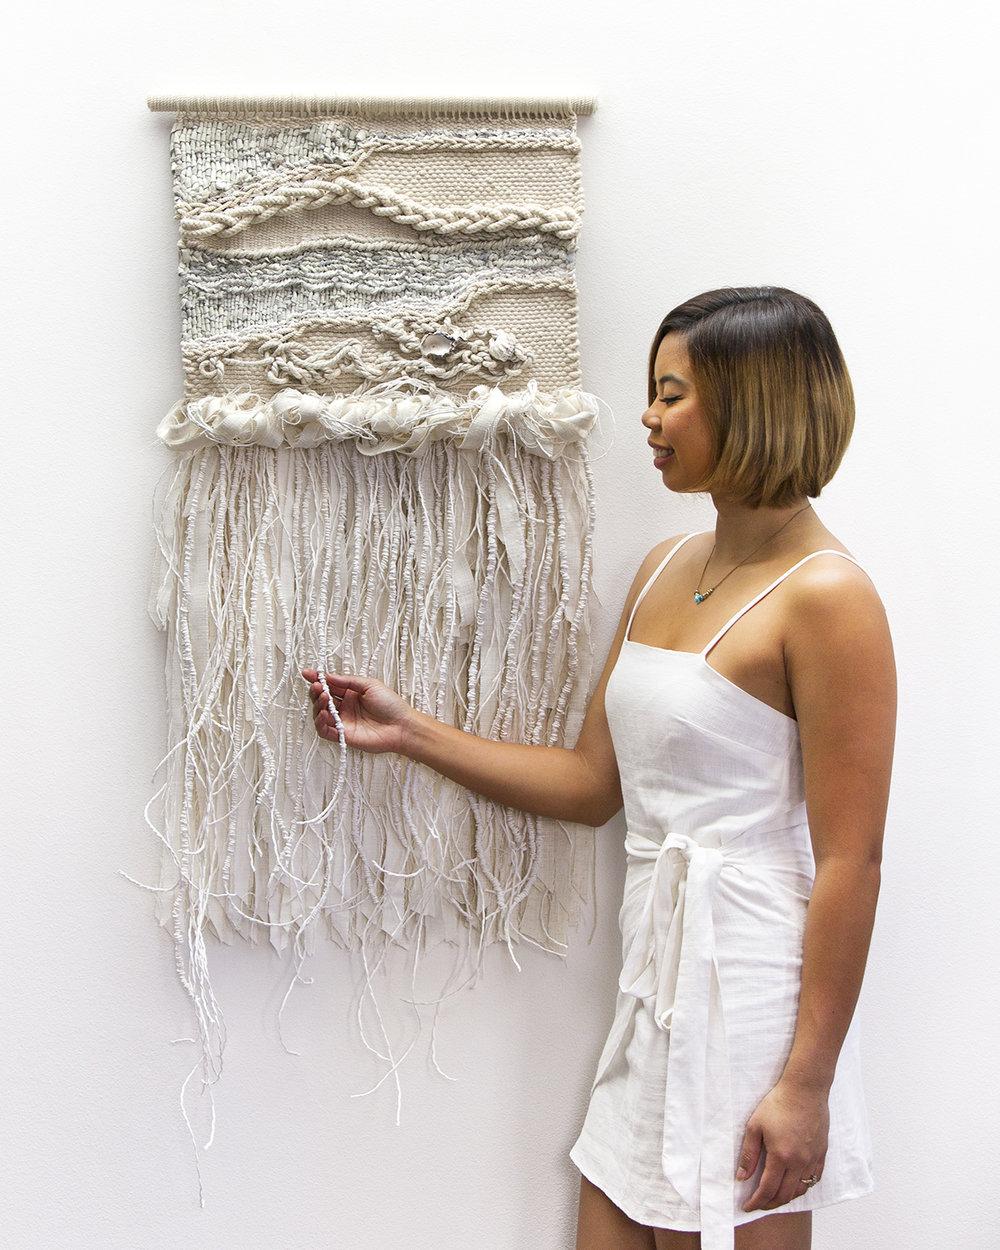 'WHITE SAND' - AU $1,300.00